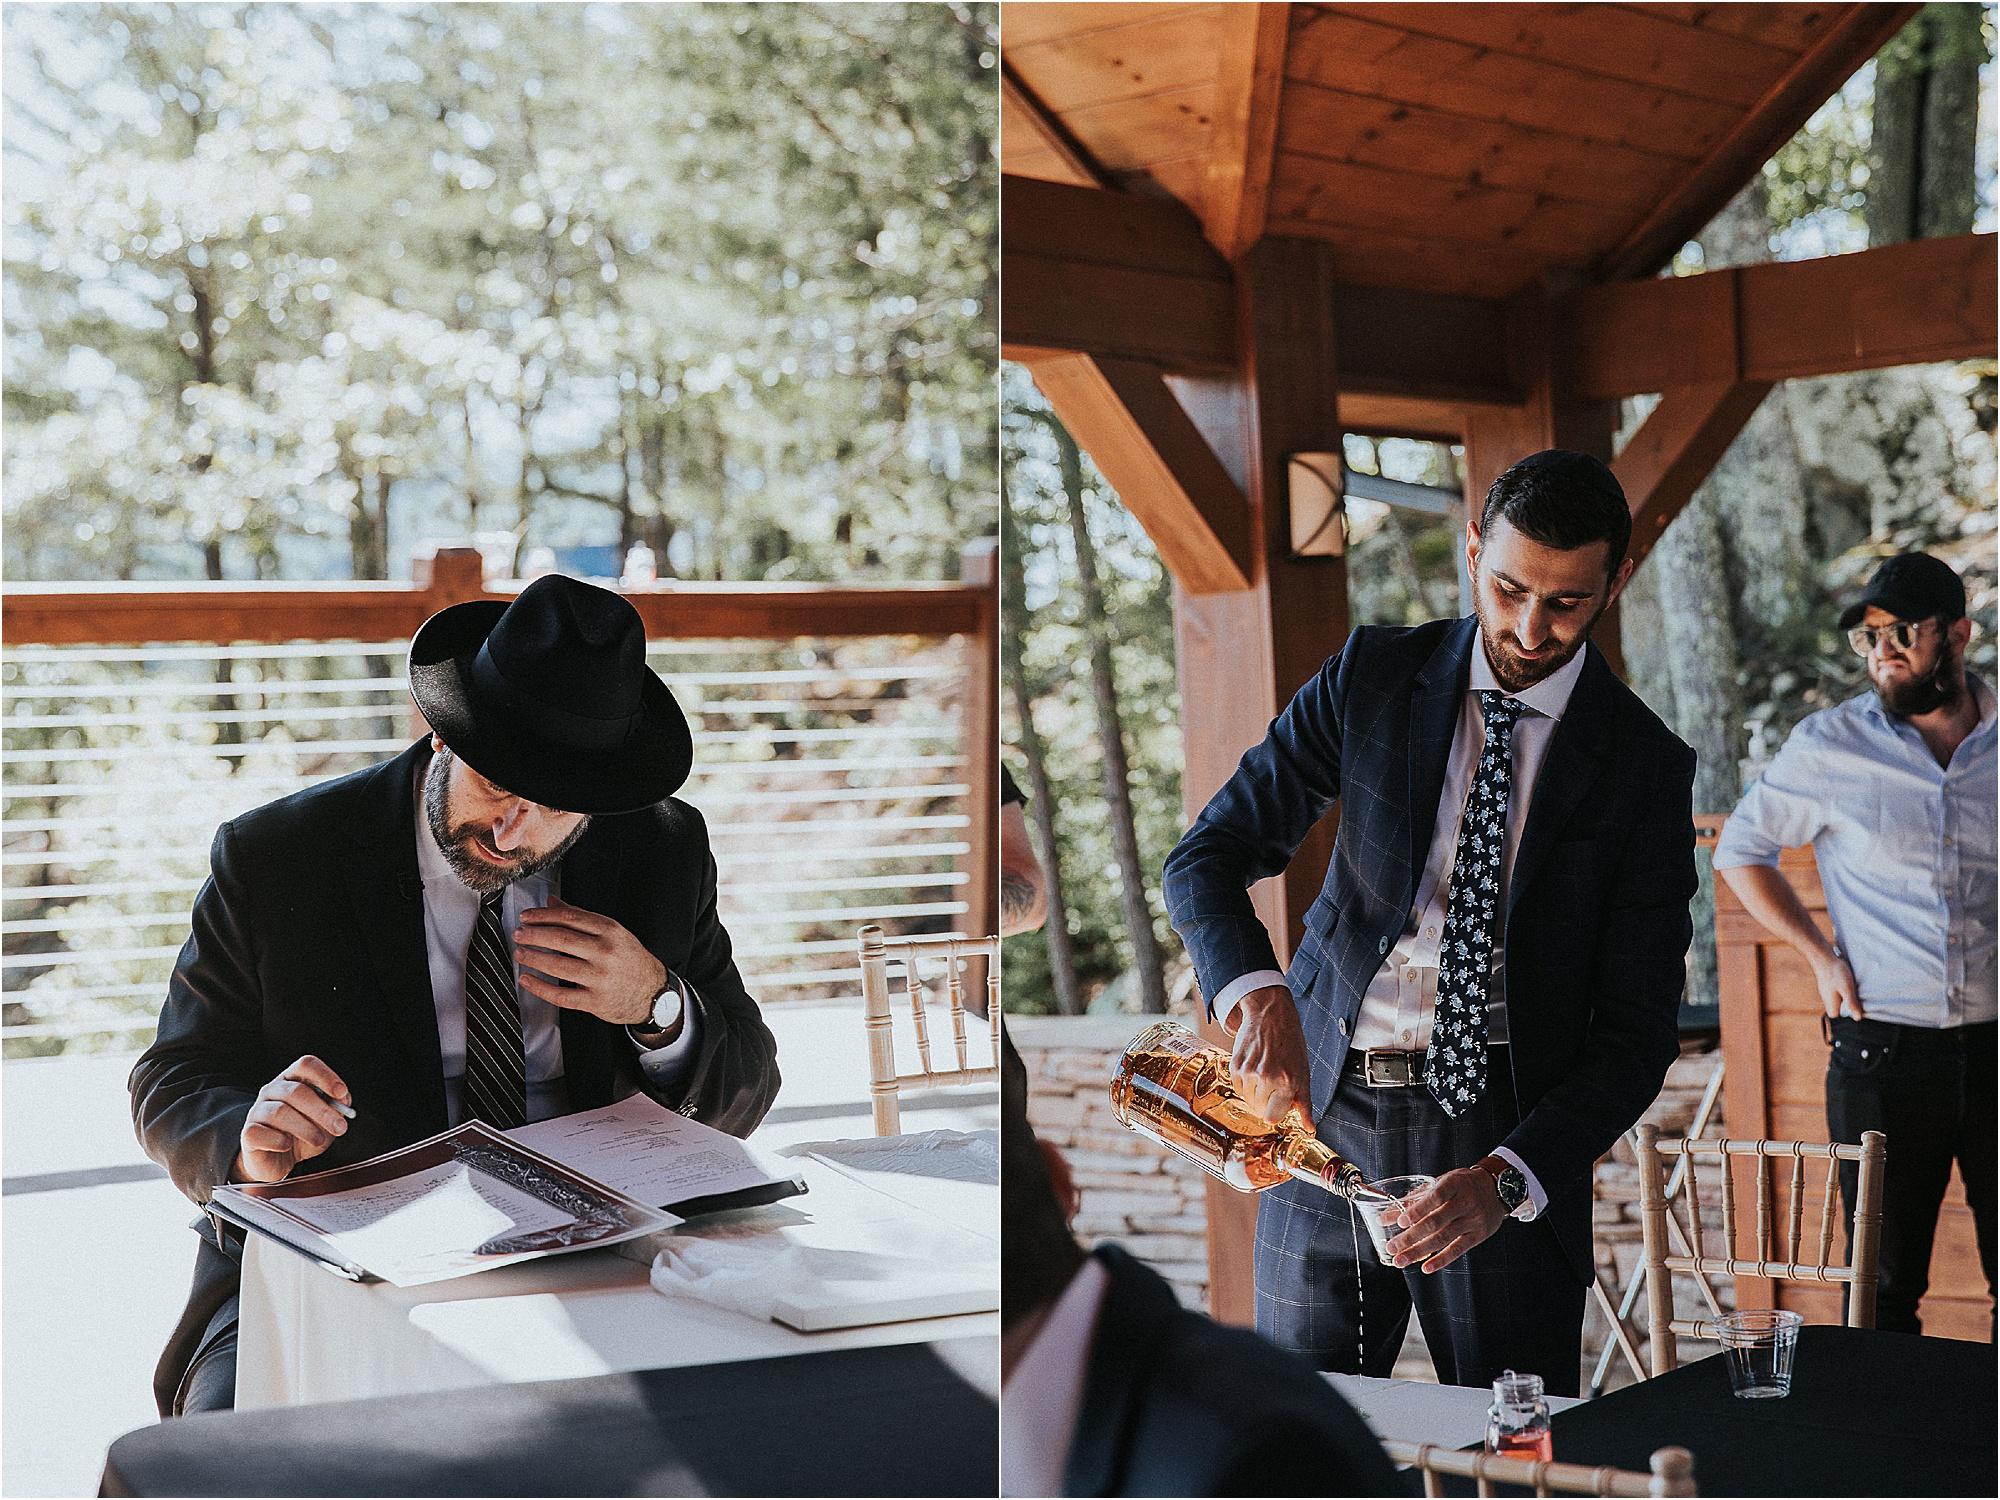 The Ketubah Signing at wedding